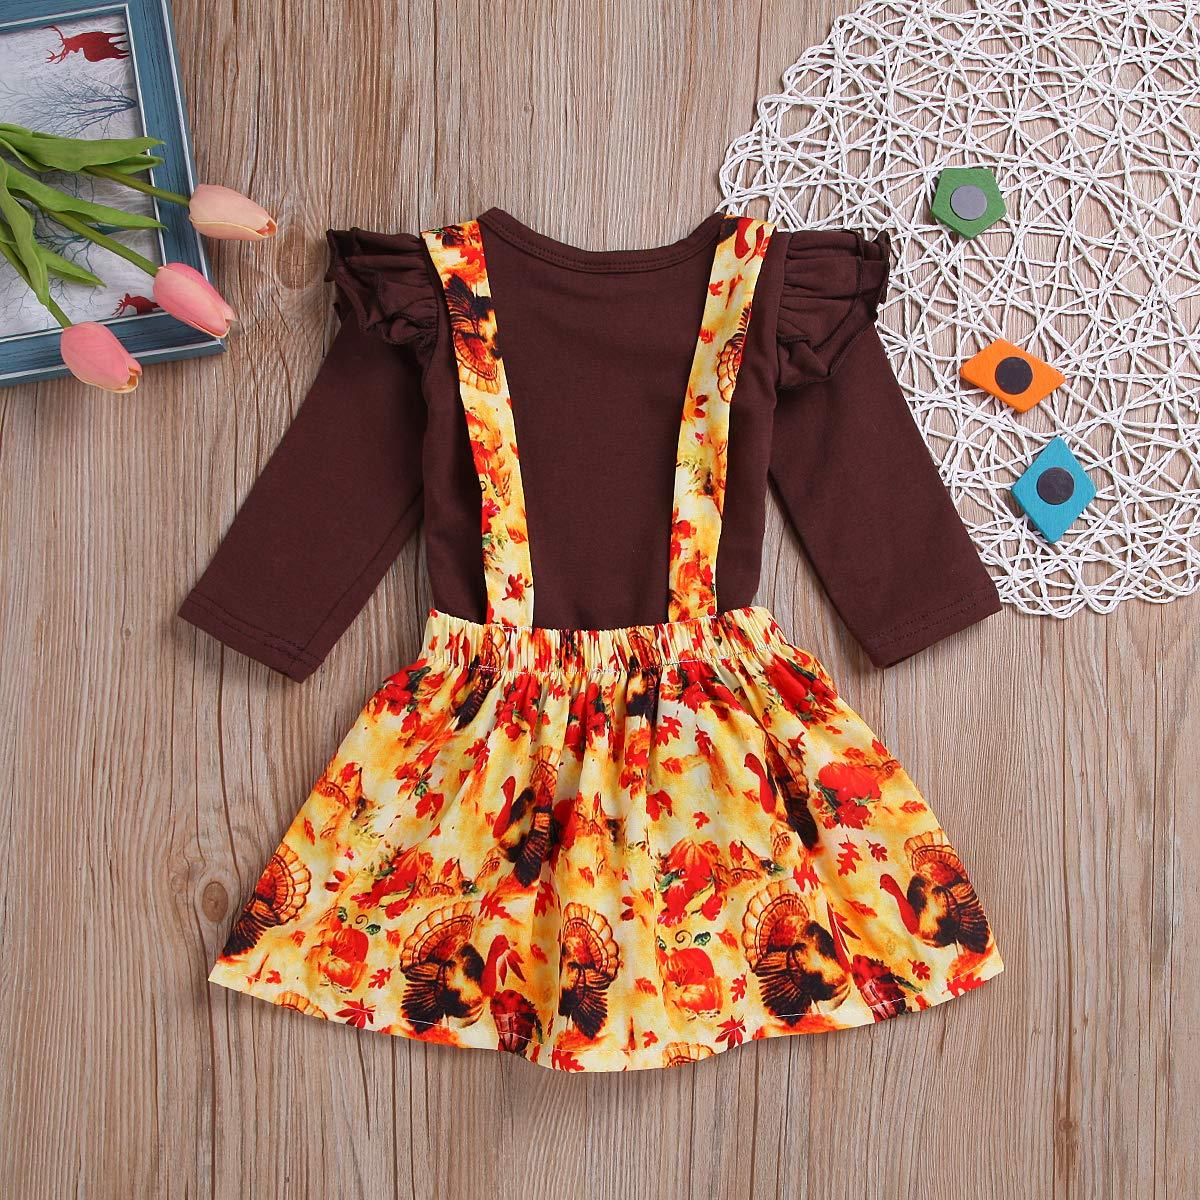 ZOELNIC Baby Girls Thanksgiving Outfit Ruffles Long Sleeve Romper Turkey Suspenders Skirt Set